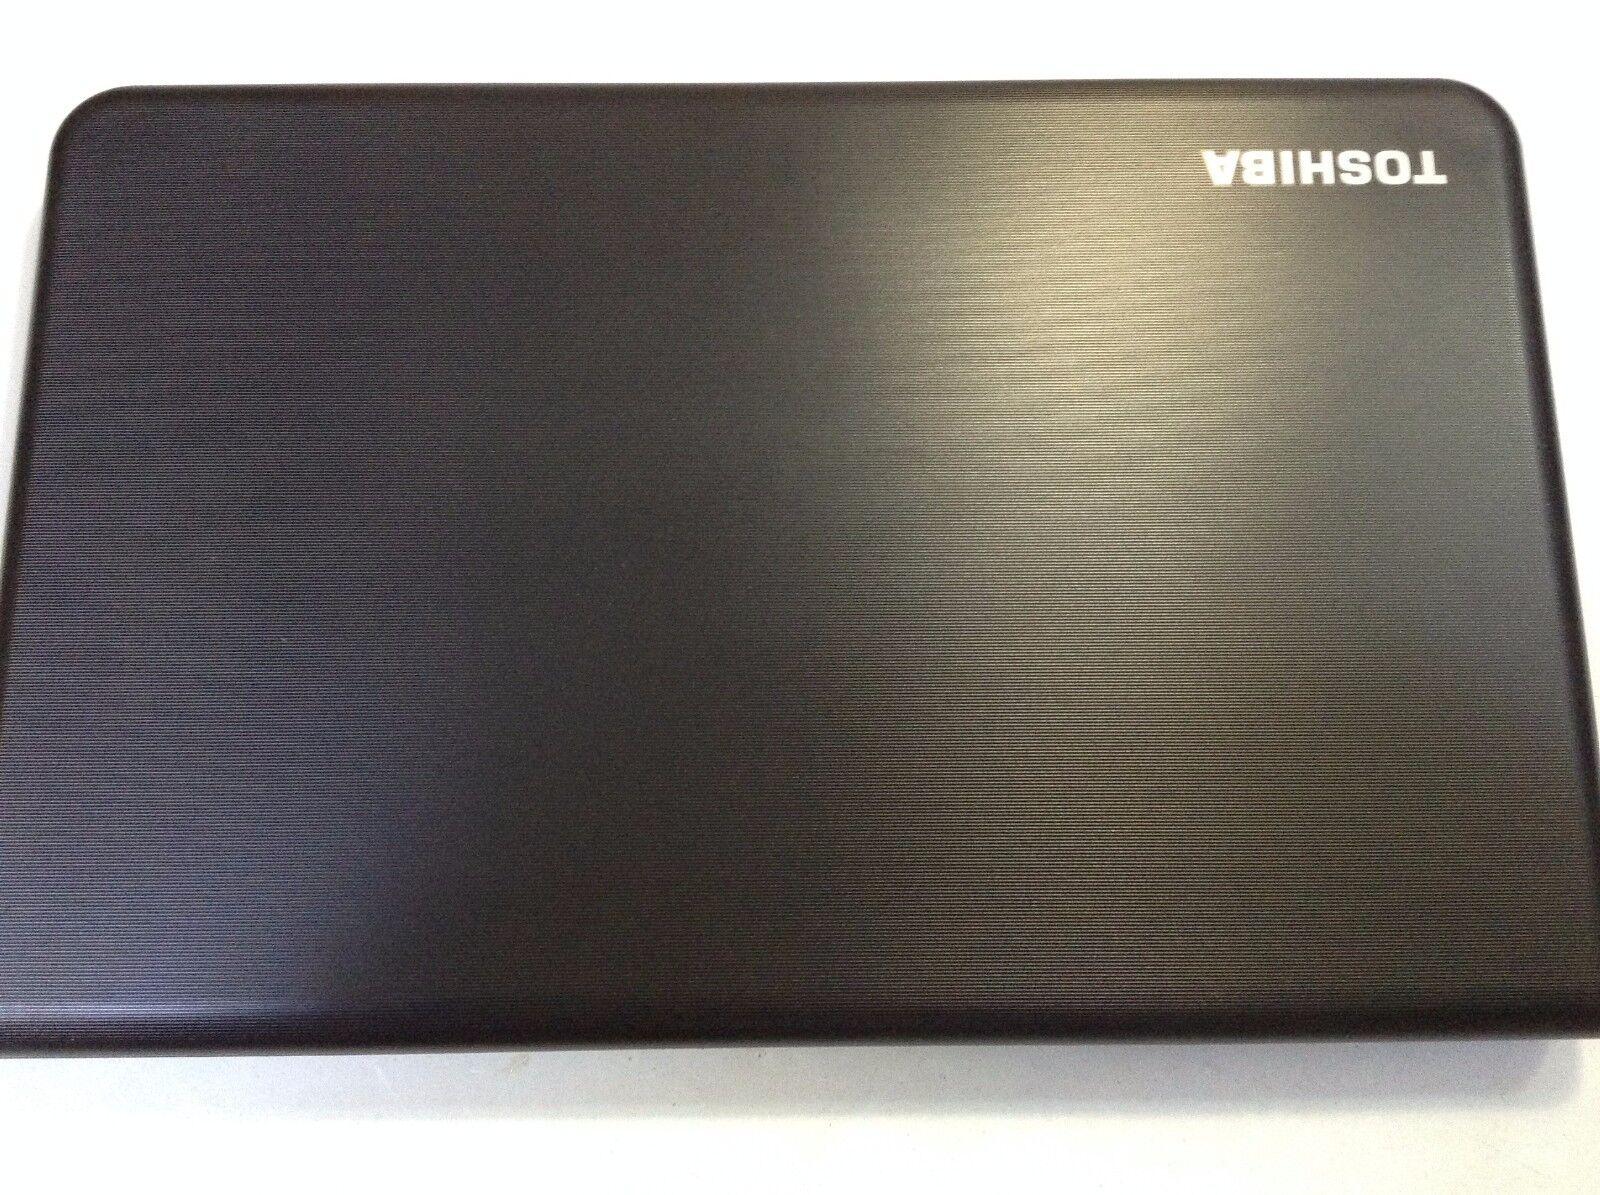 "Toshiba Satellite C55D-A5340 15.6""  (AMD E1-2100   4GB  500GB)"